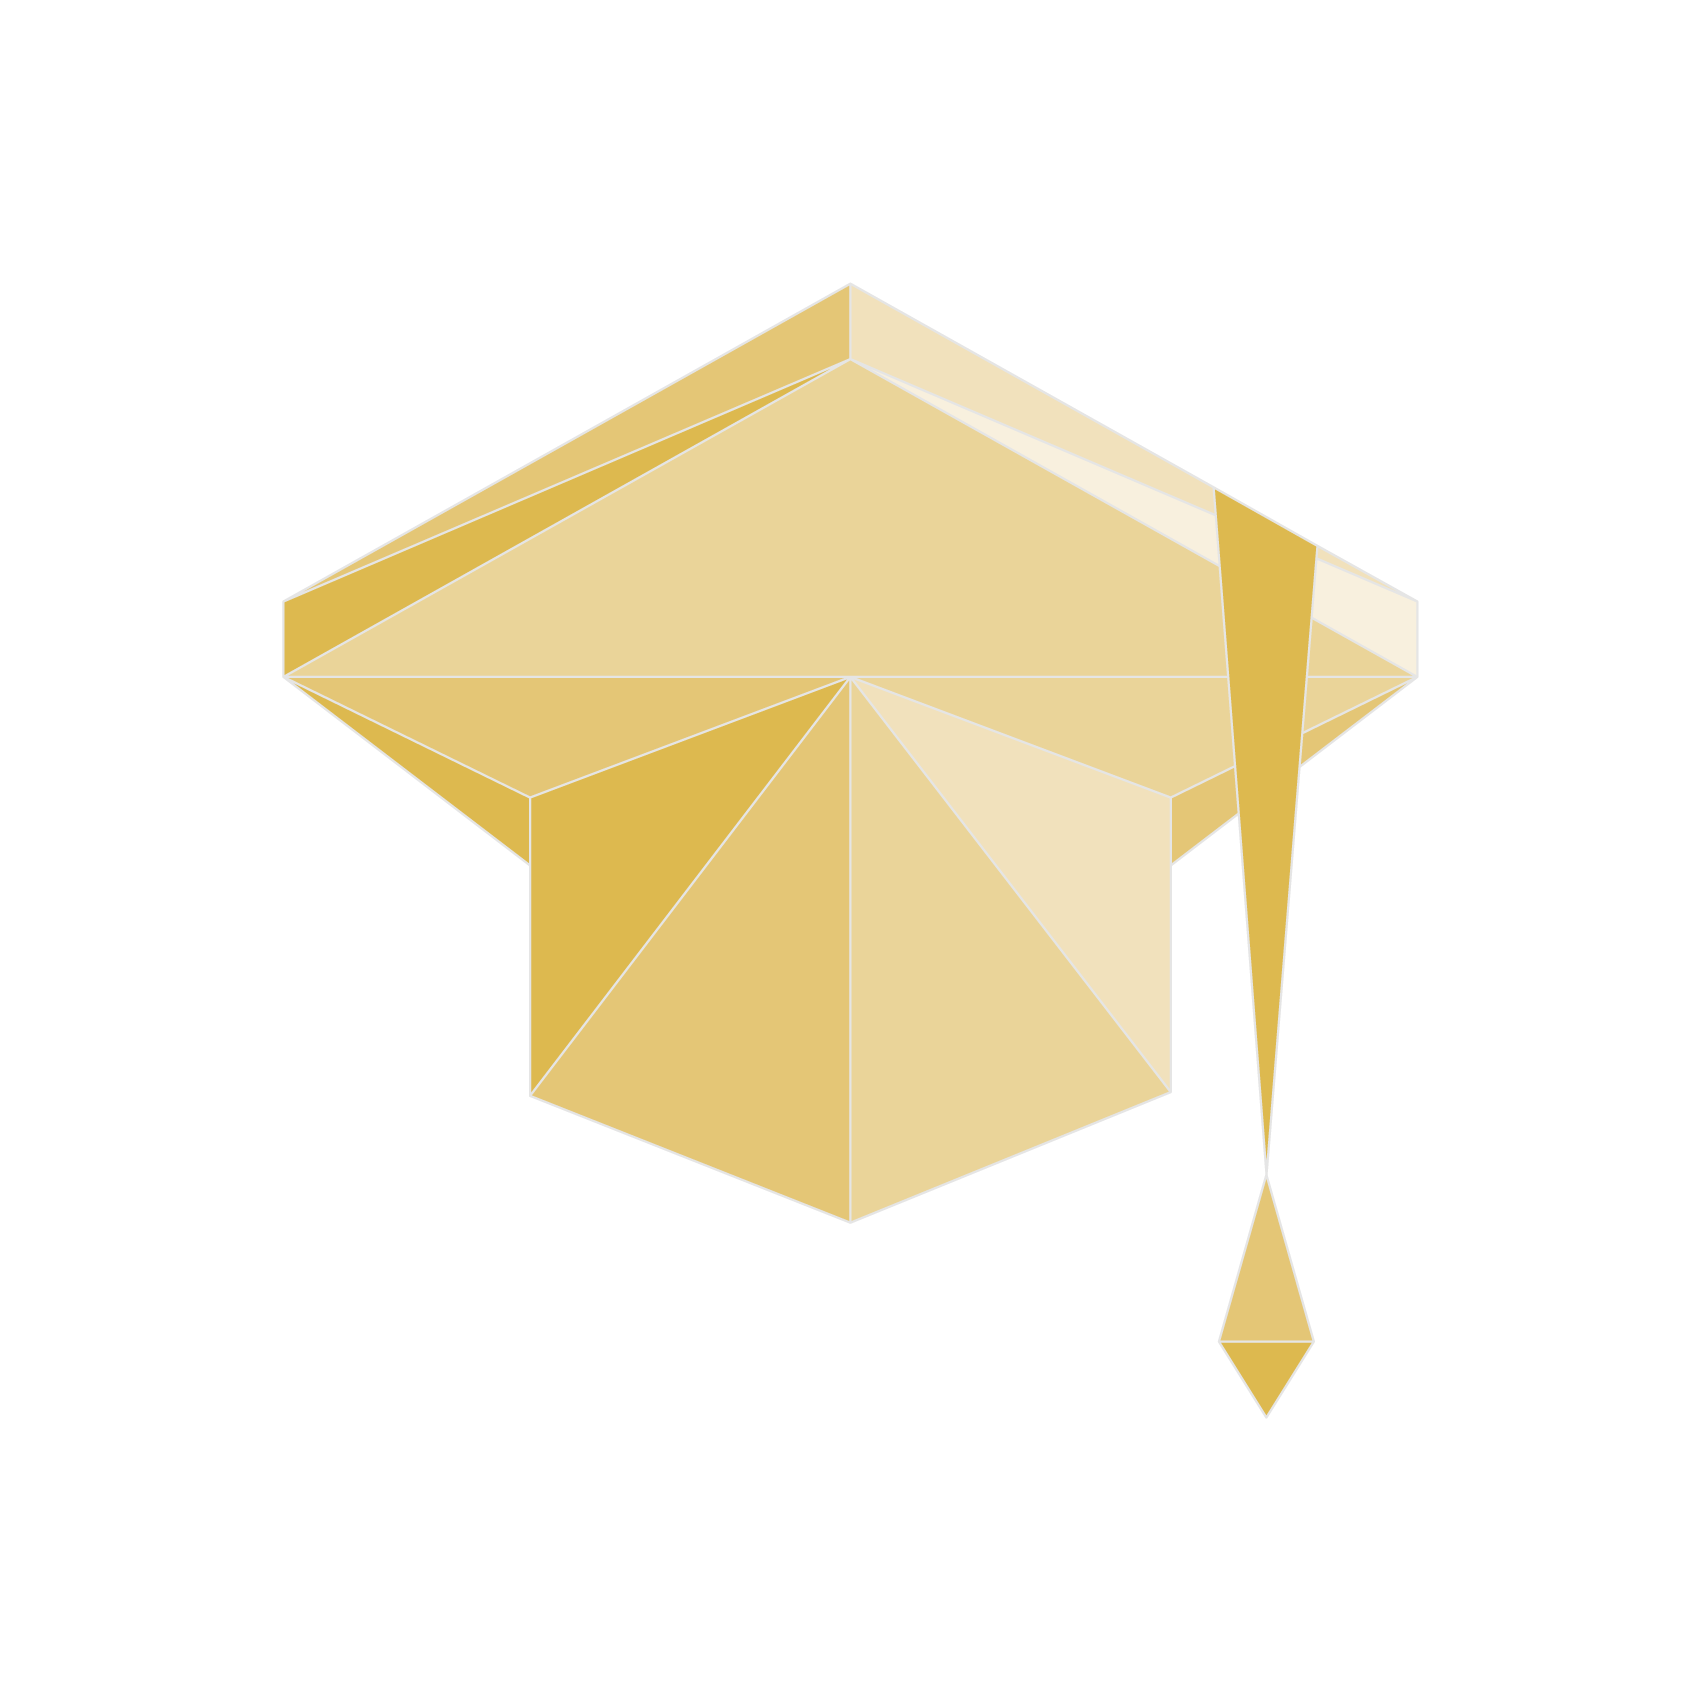 grandega_illustration_allgemein_academy_gold_rgb